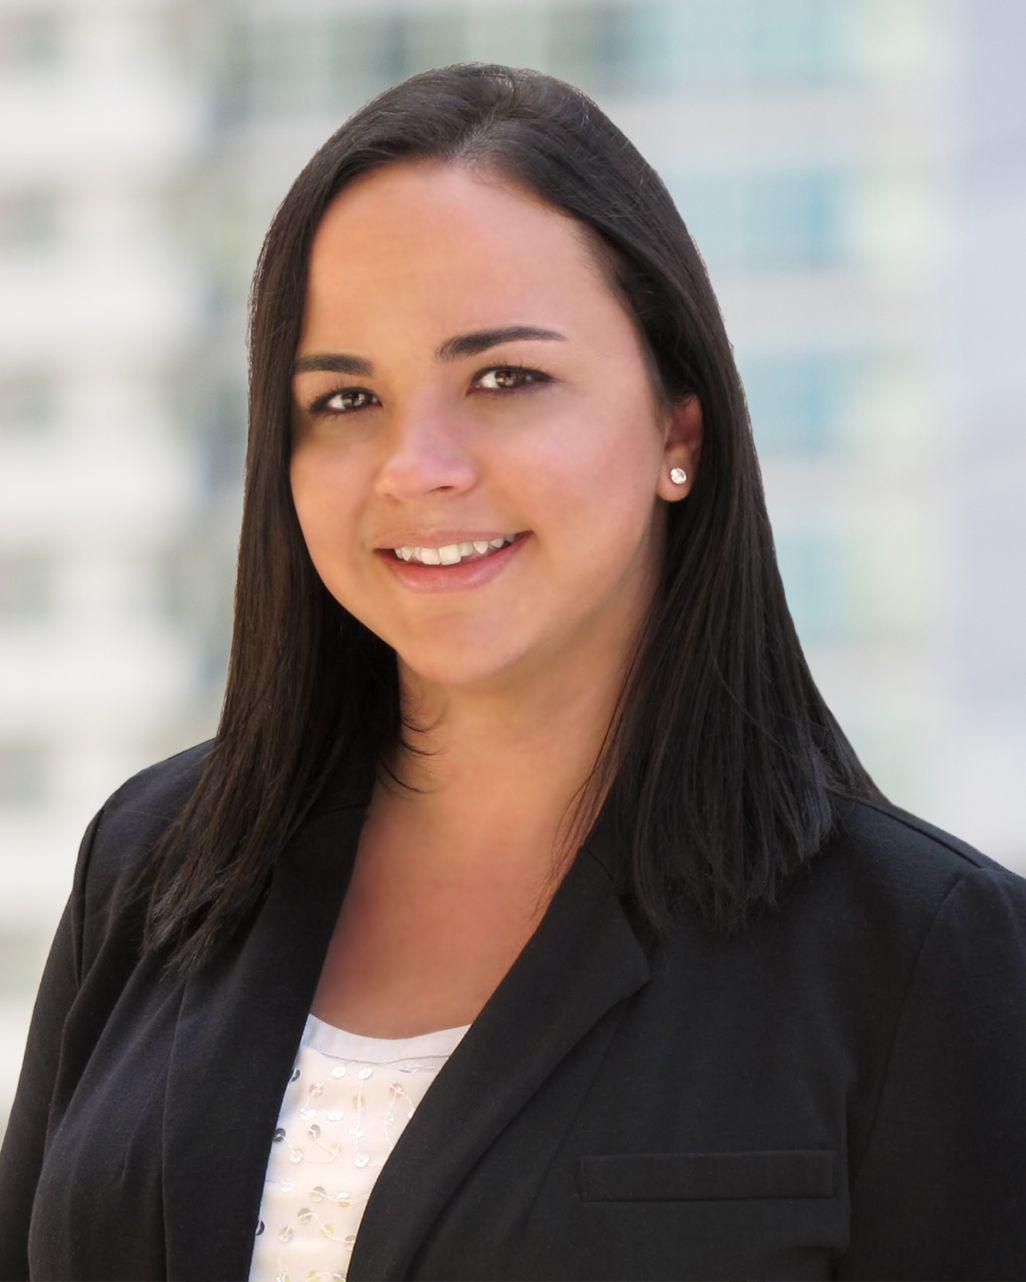 Melissa Enderby, Cavignac & Associates